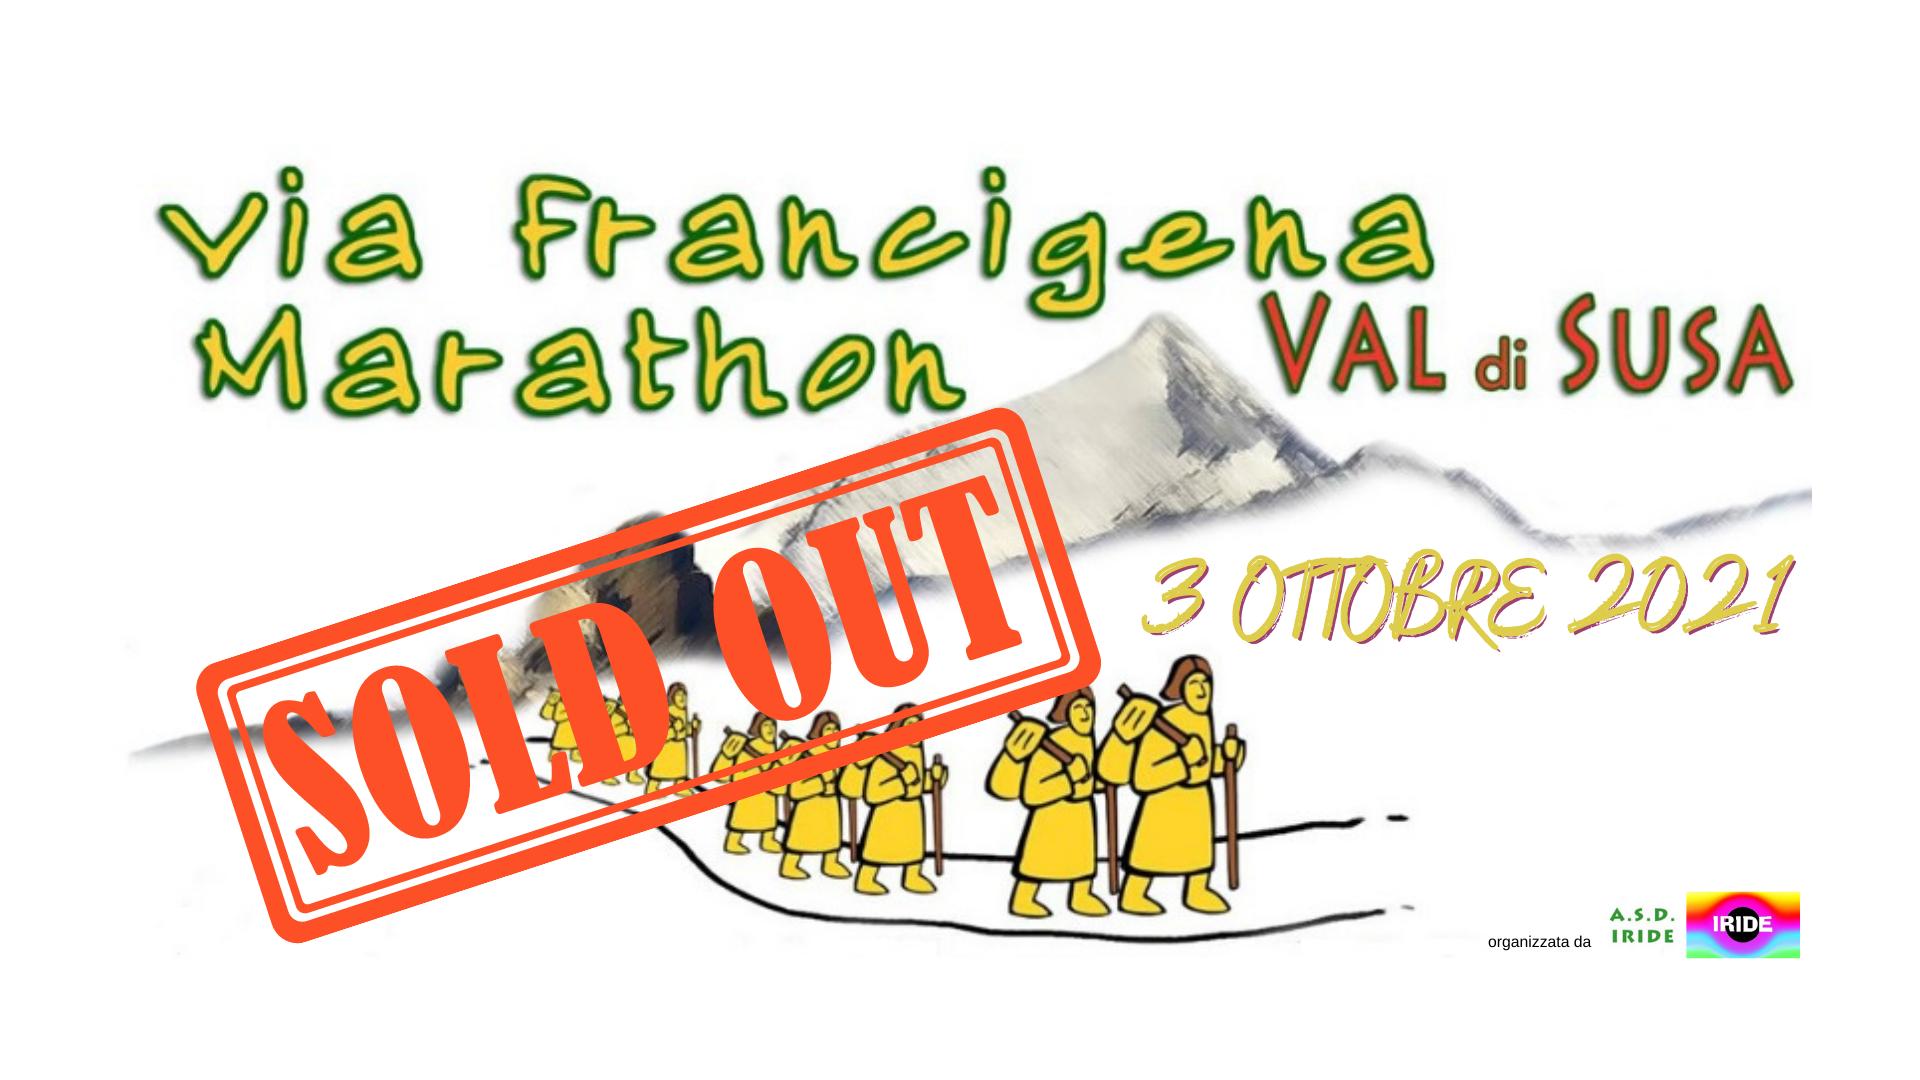 La Via Francigena Marathon Val di Susa si farà nel 2021